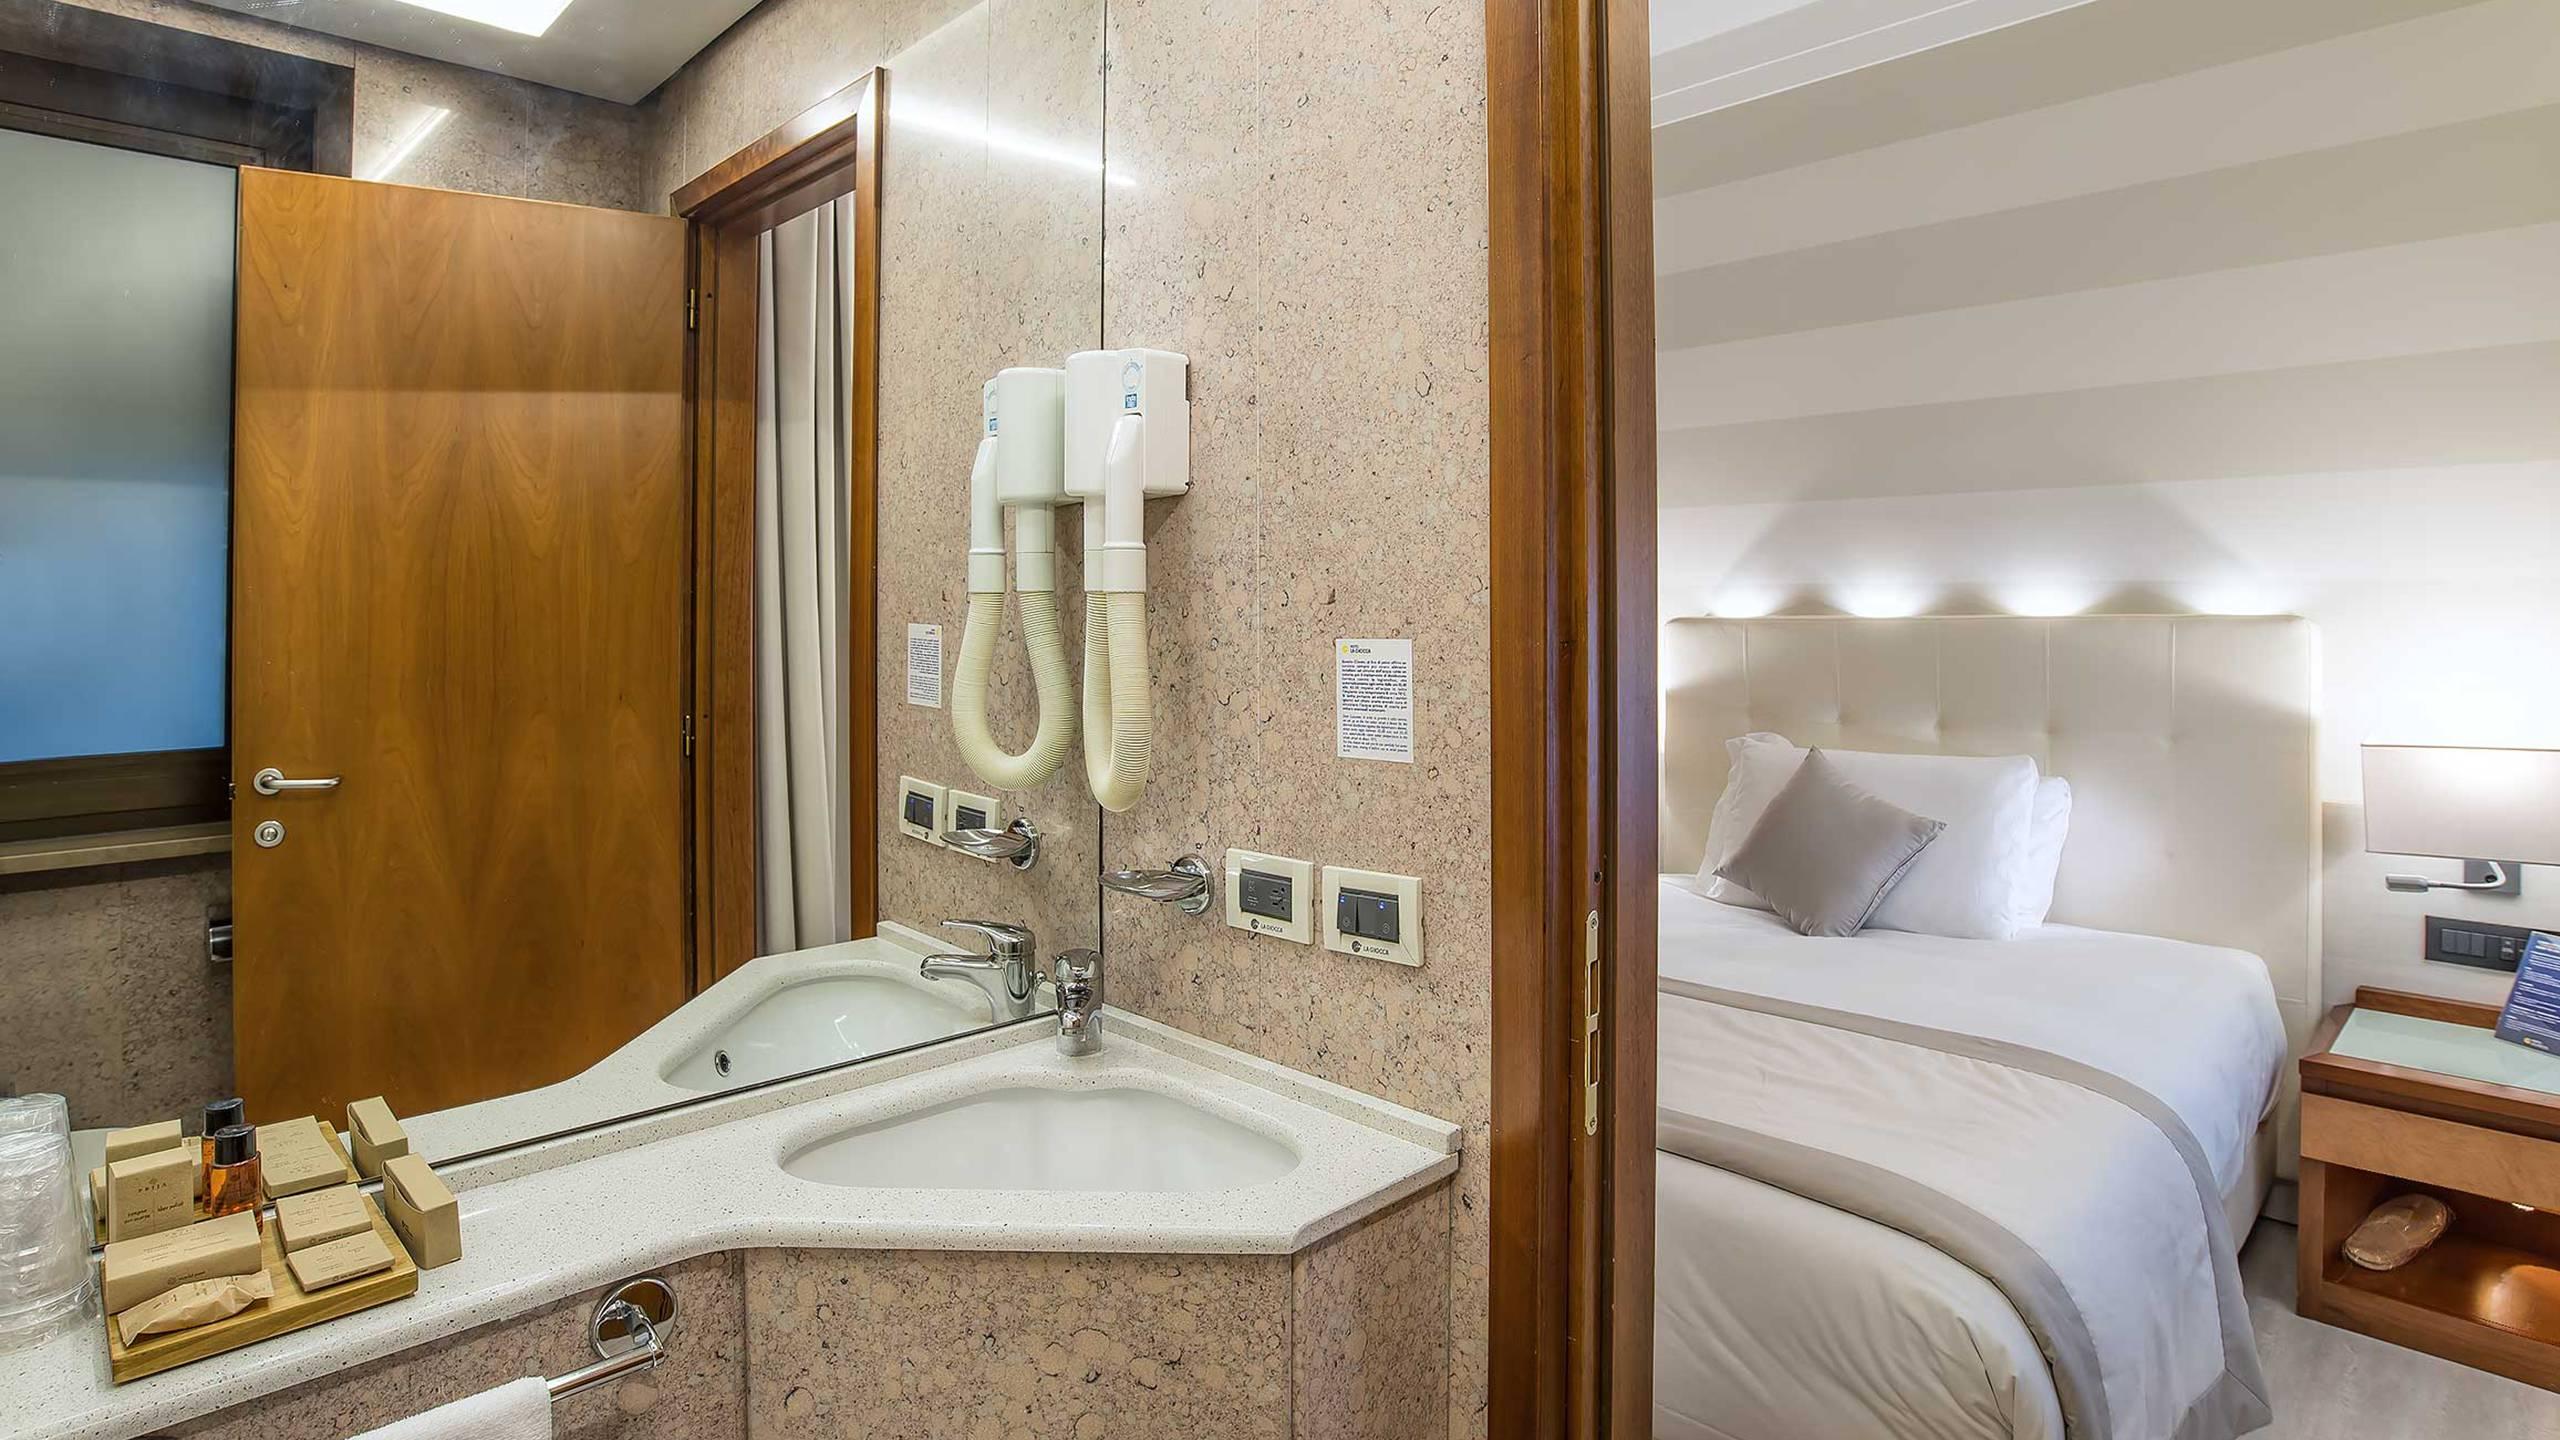 Hotel-La-Giocca-Roma-superior-single-room-bathroom-4